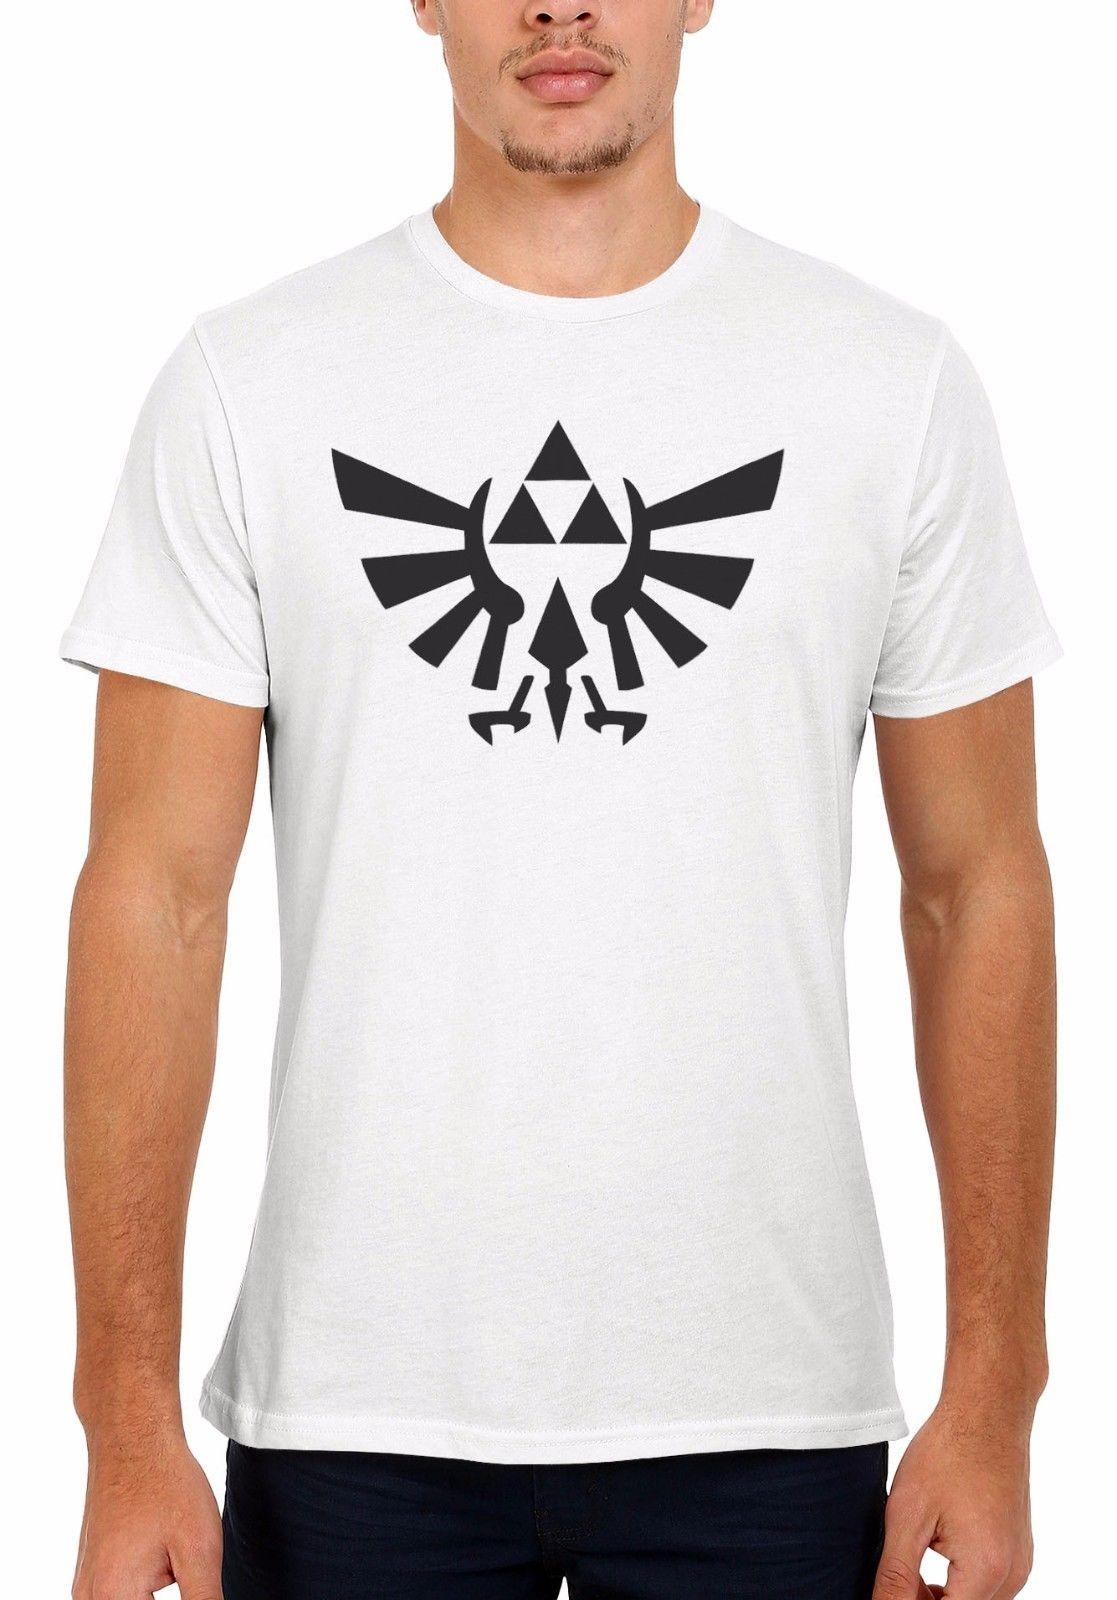 e606156ff Legend Of Zelda Triforce Legion Game Men Women Vest Tank Top Unisex T Shirt  161E Printed T Shirt Funny T Shirts For Guys From Onecktshirt, $11.17|  DHgate.